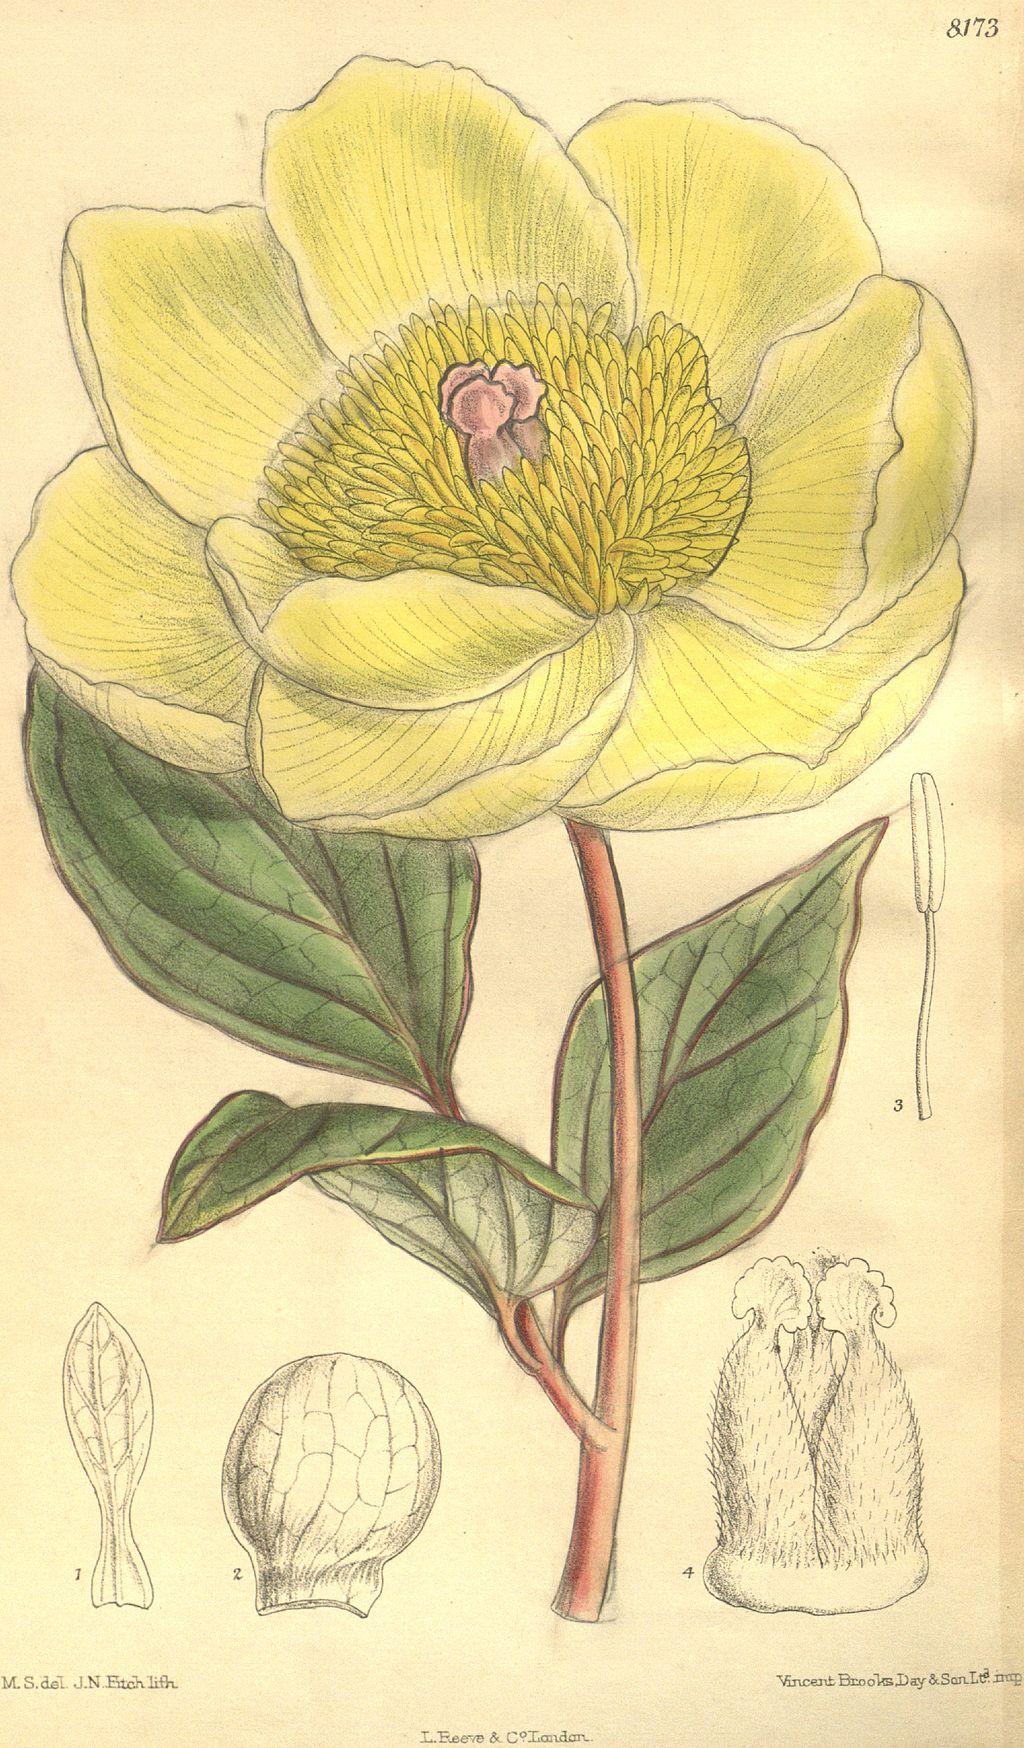 Paeonia daurica subsp. mlokosewitschii Bot. Mag. 134. 8173. 1908